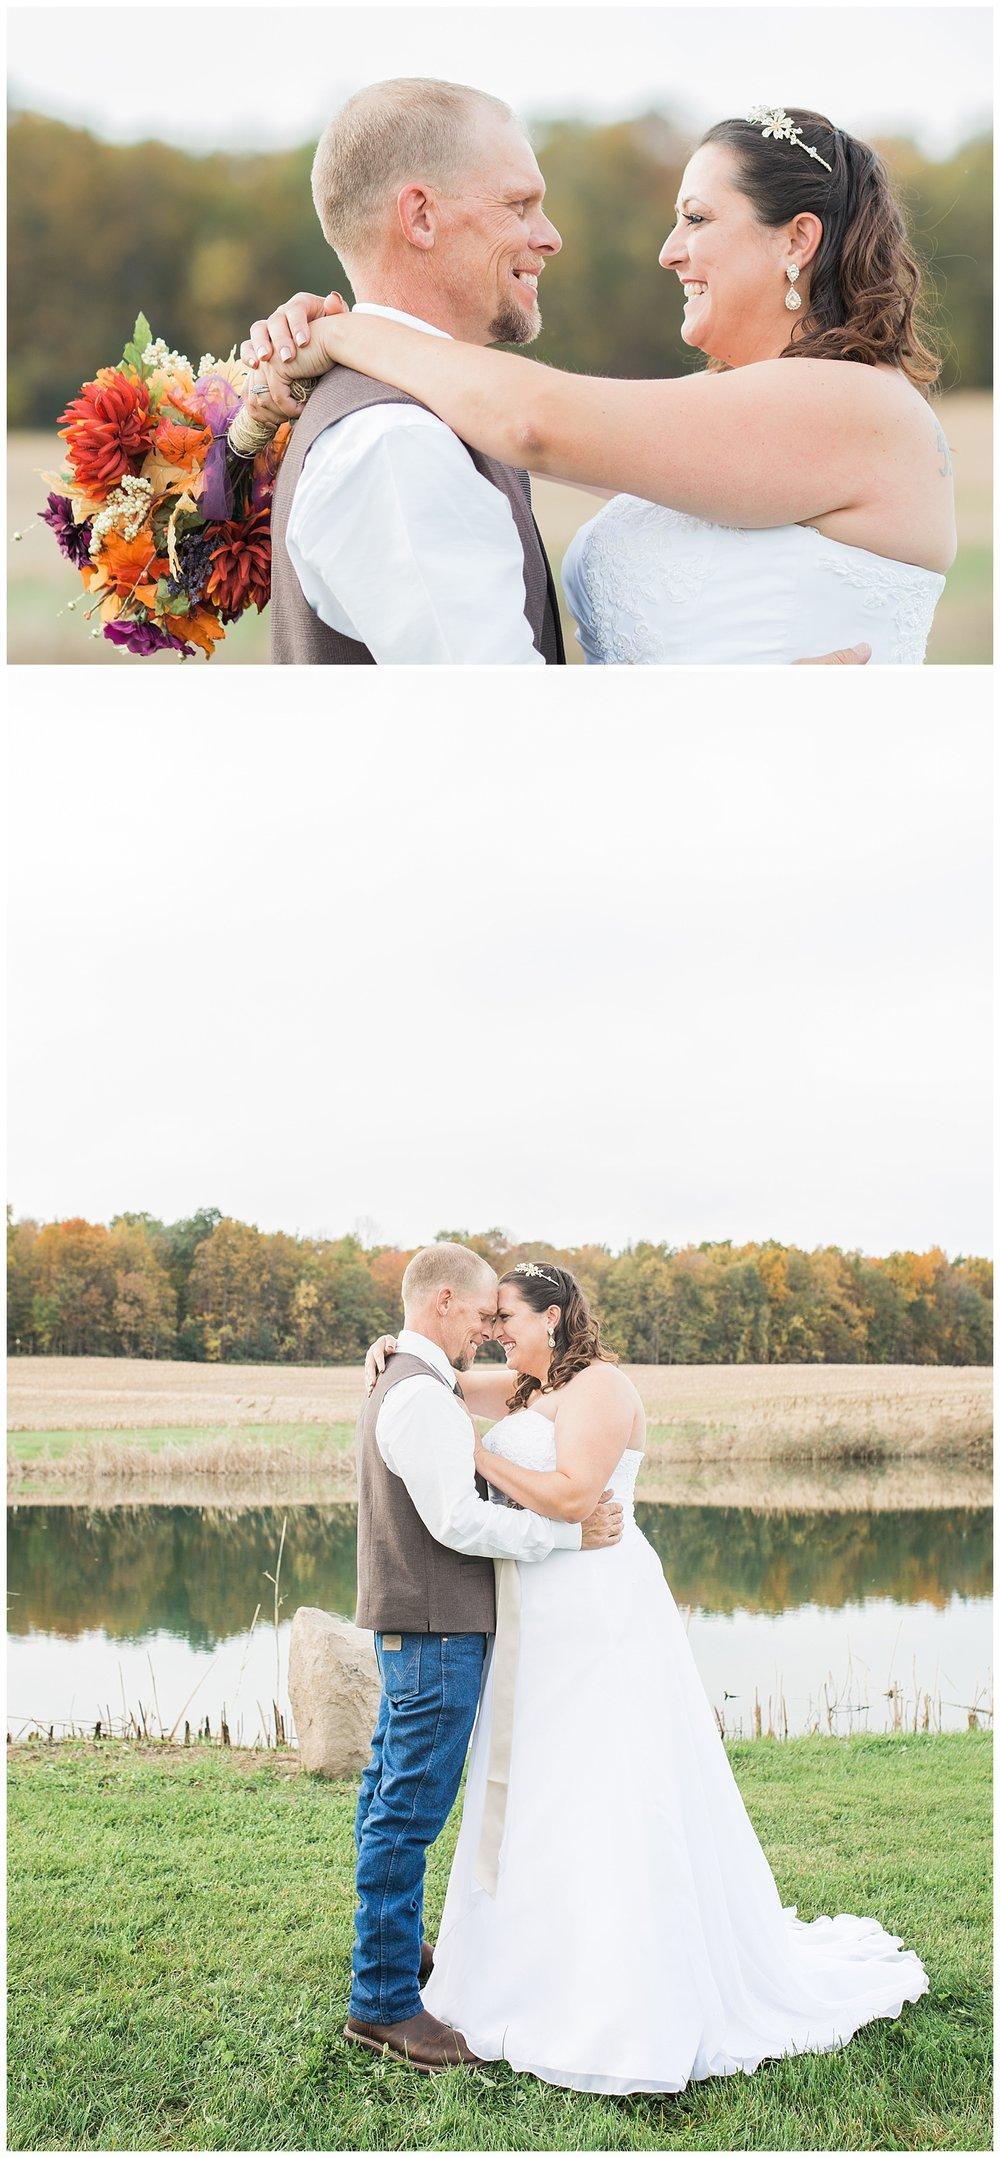 The Hall Wedding - York NY - Lass and Beau-650_Buffalo wedding photography.jpg